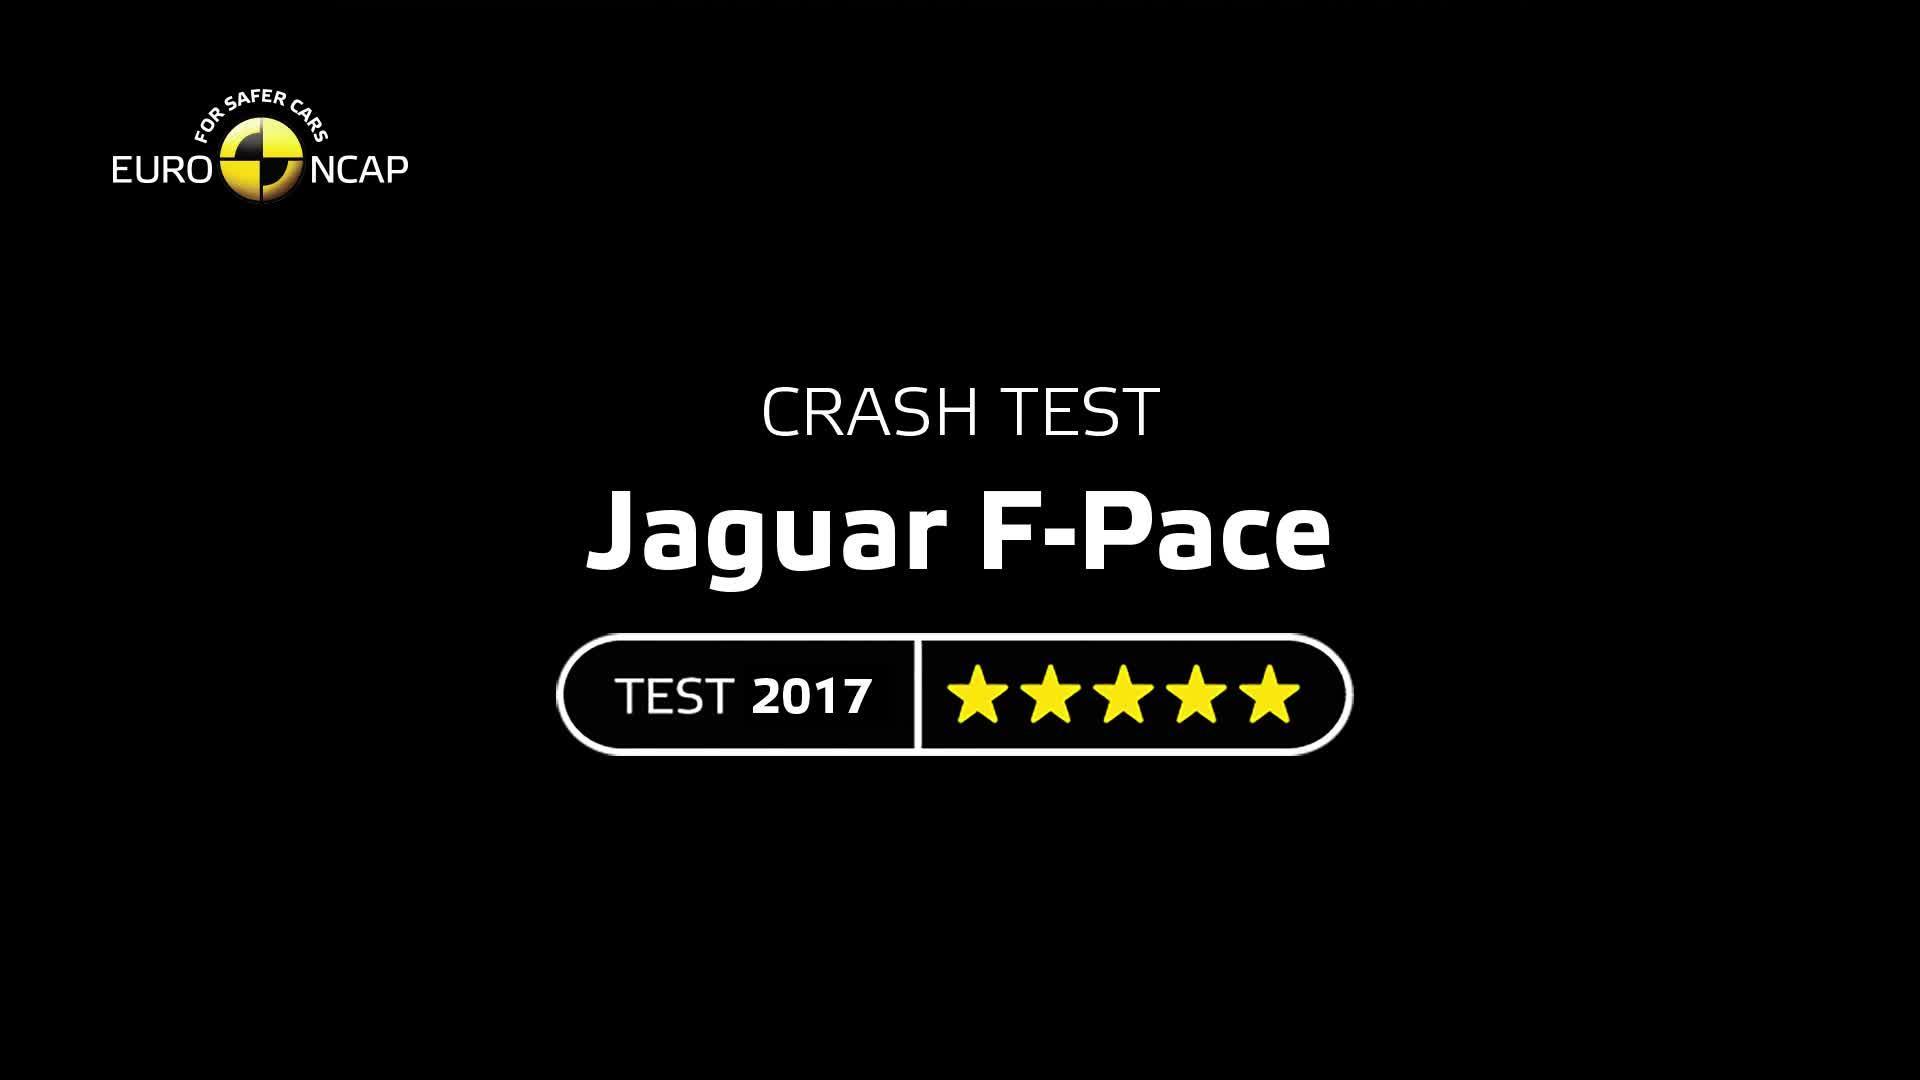 Jaguar F-Pace - Crash Tests 2017